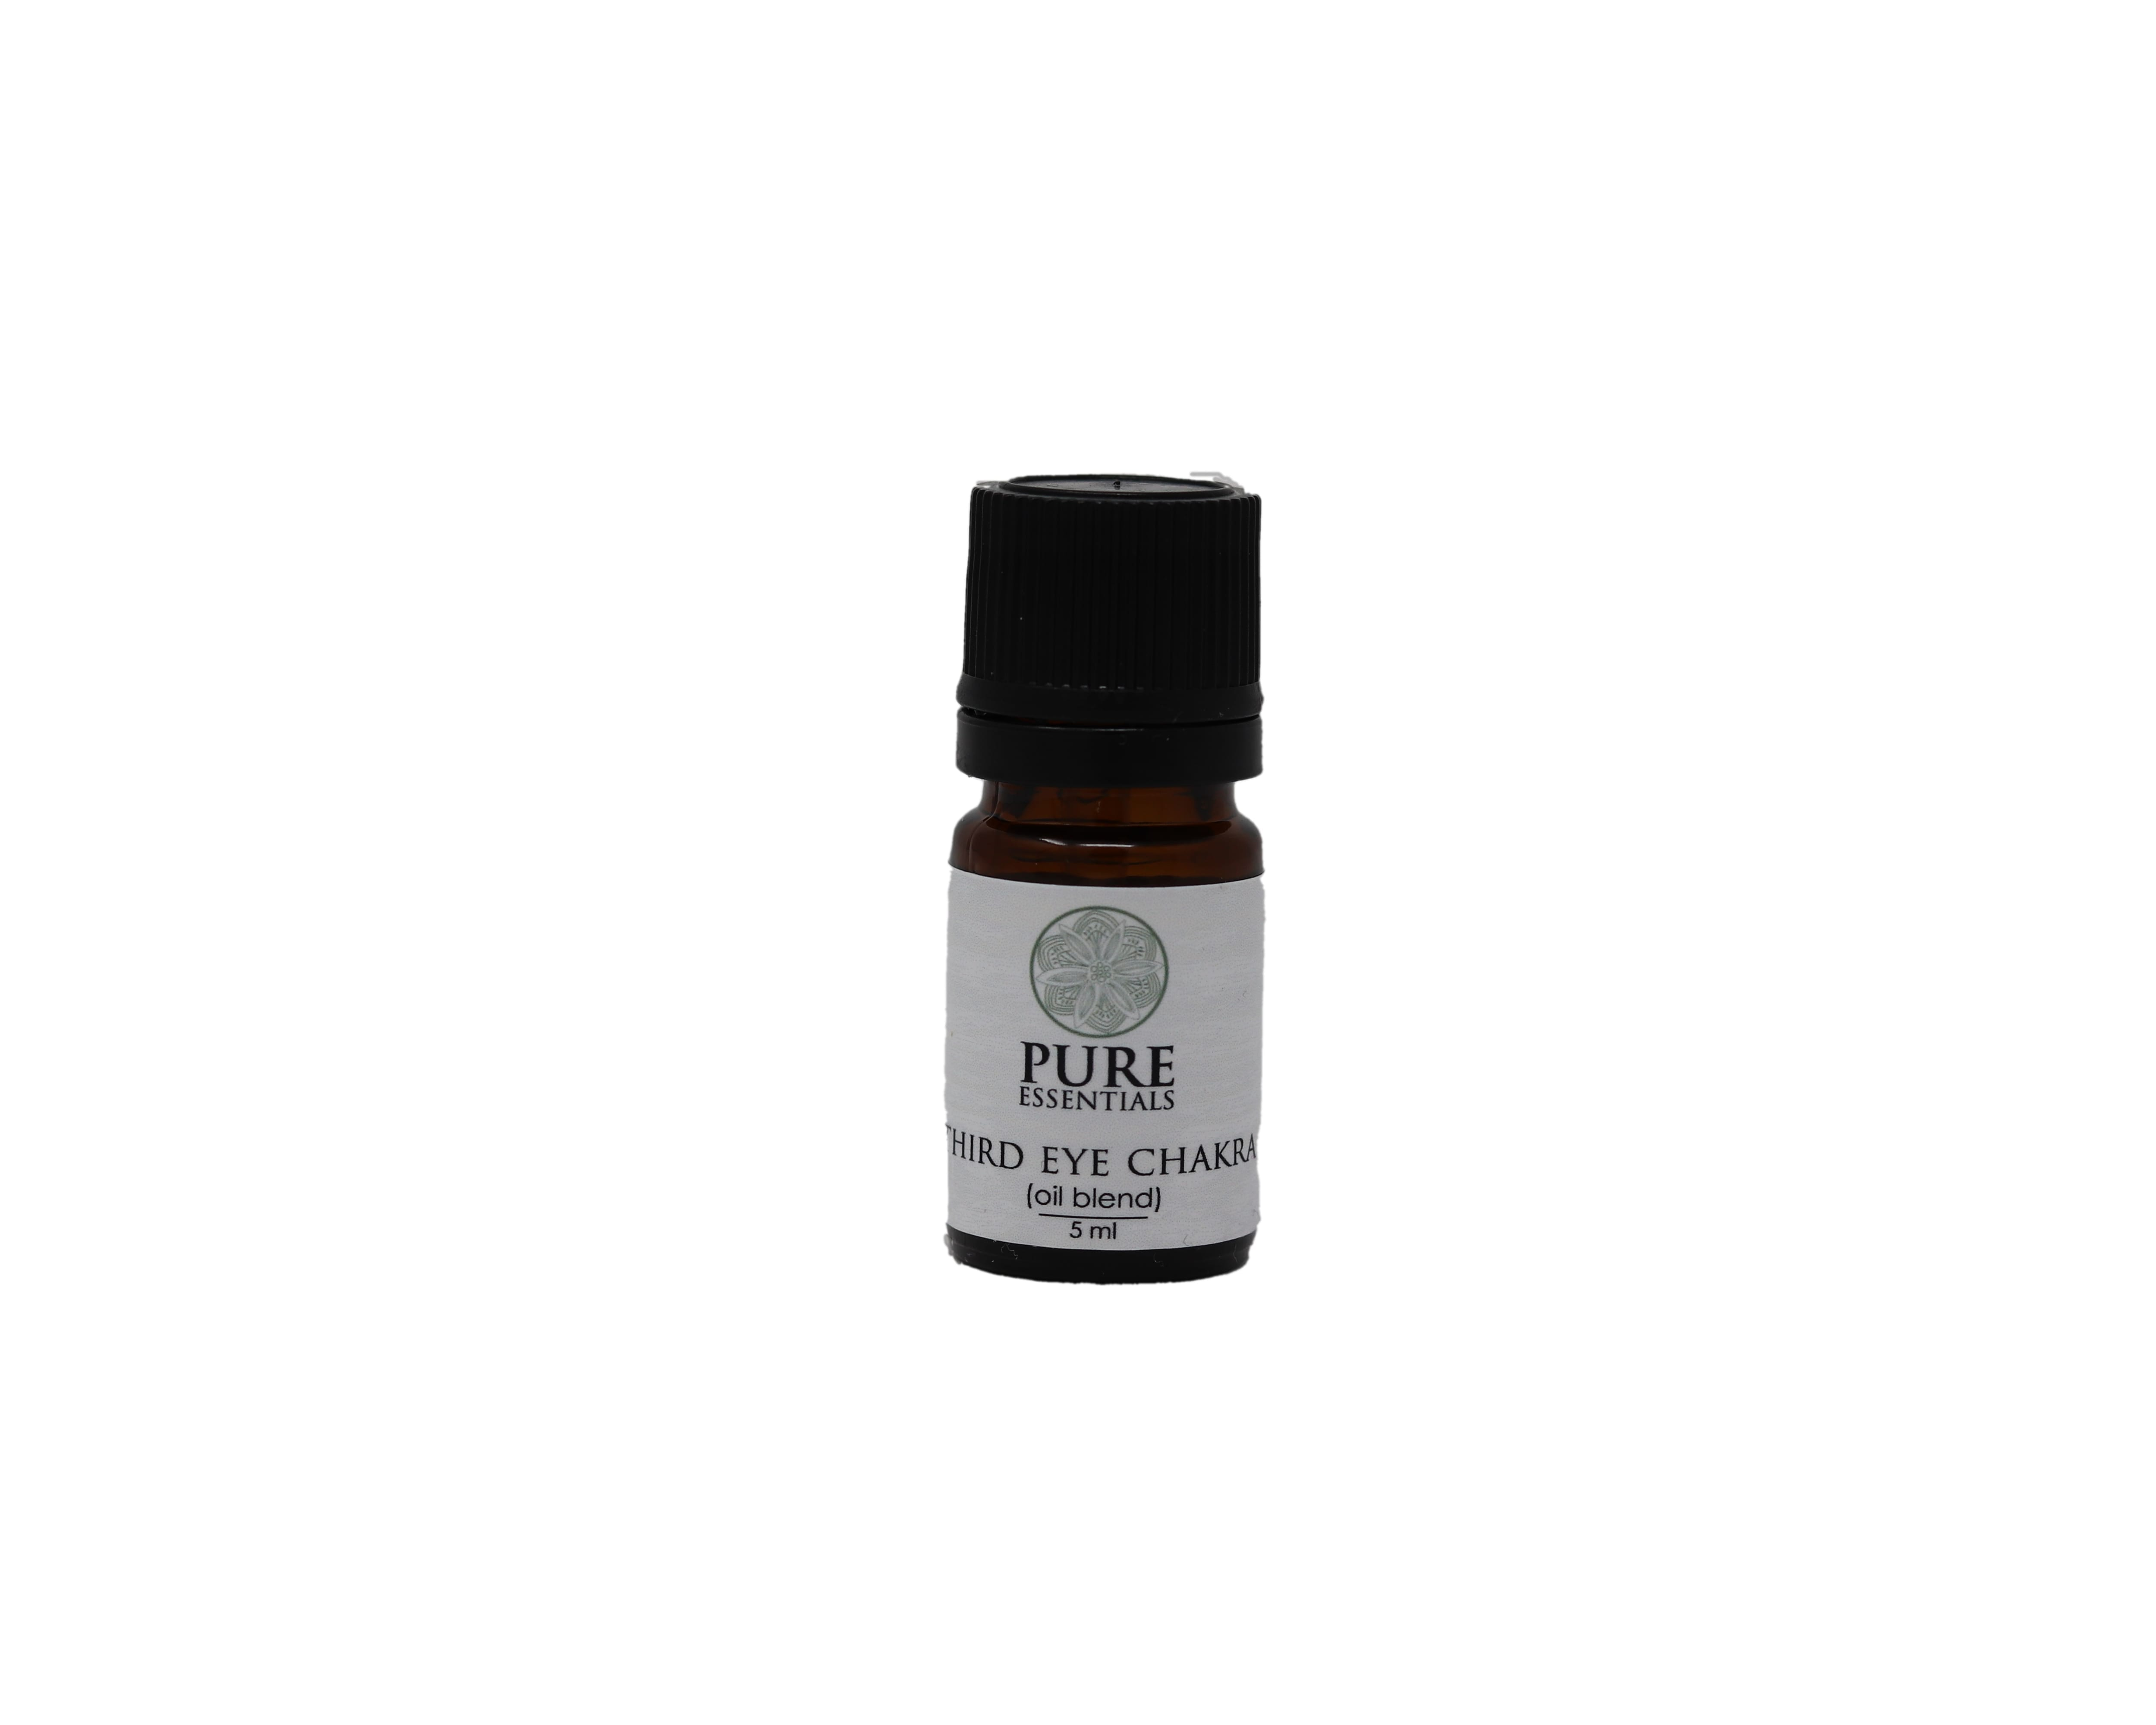 Third EDye Chakra Essential Oil Blend